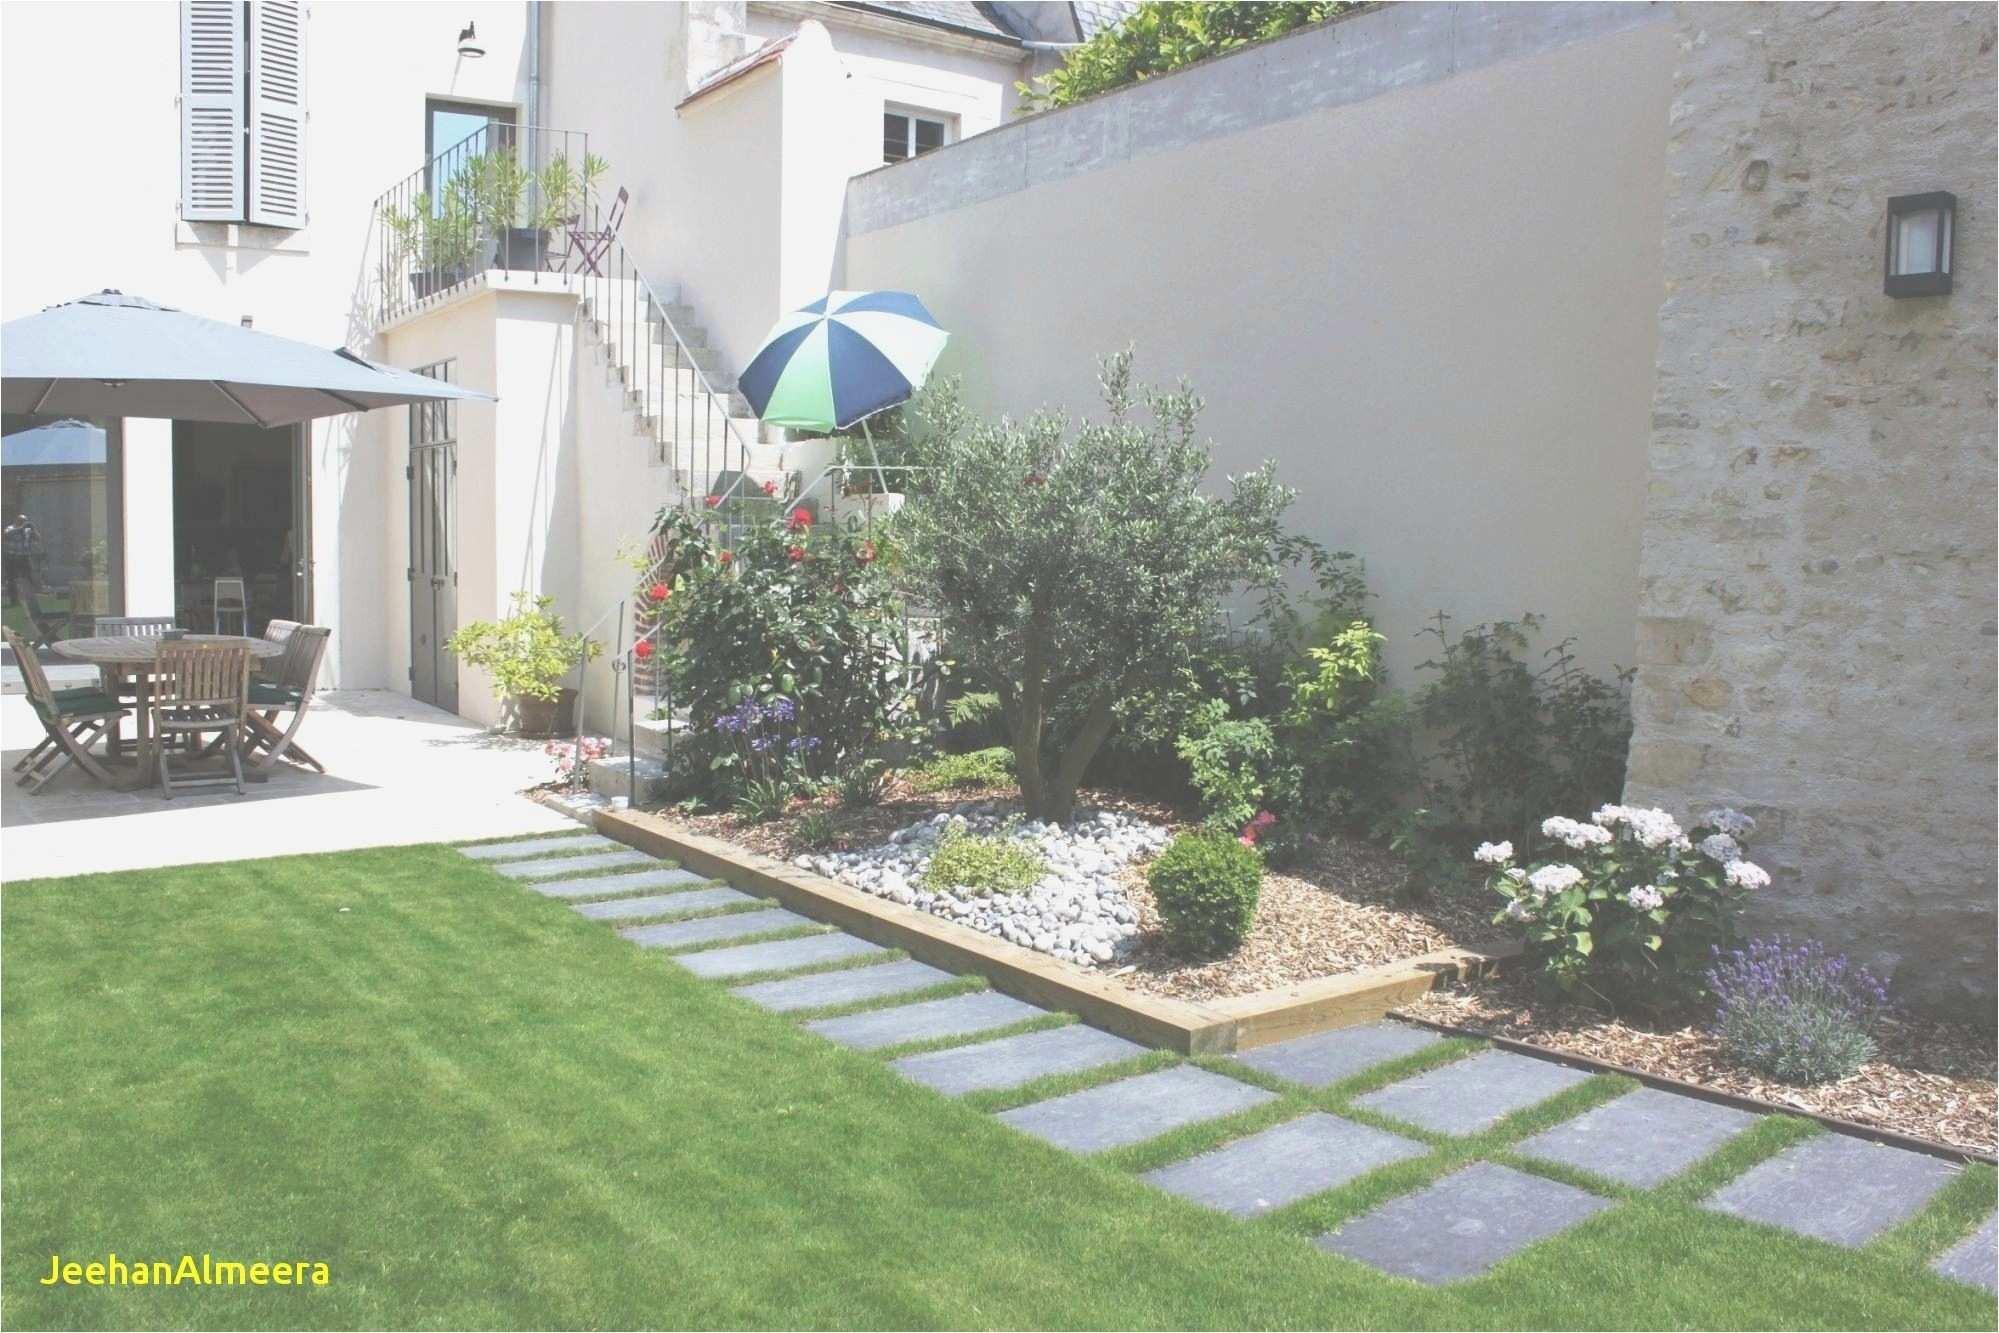 logiciel amanagement jardin logiciel amenagement jardin gratuit amenager son jardin of logiciel amanagement jardin